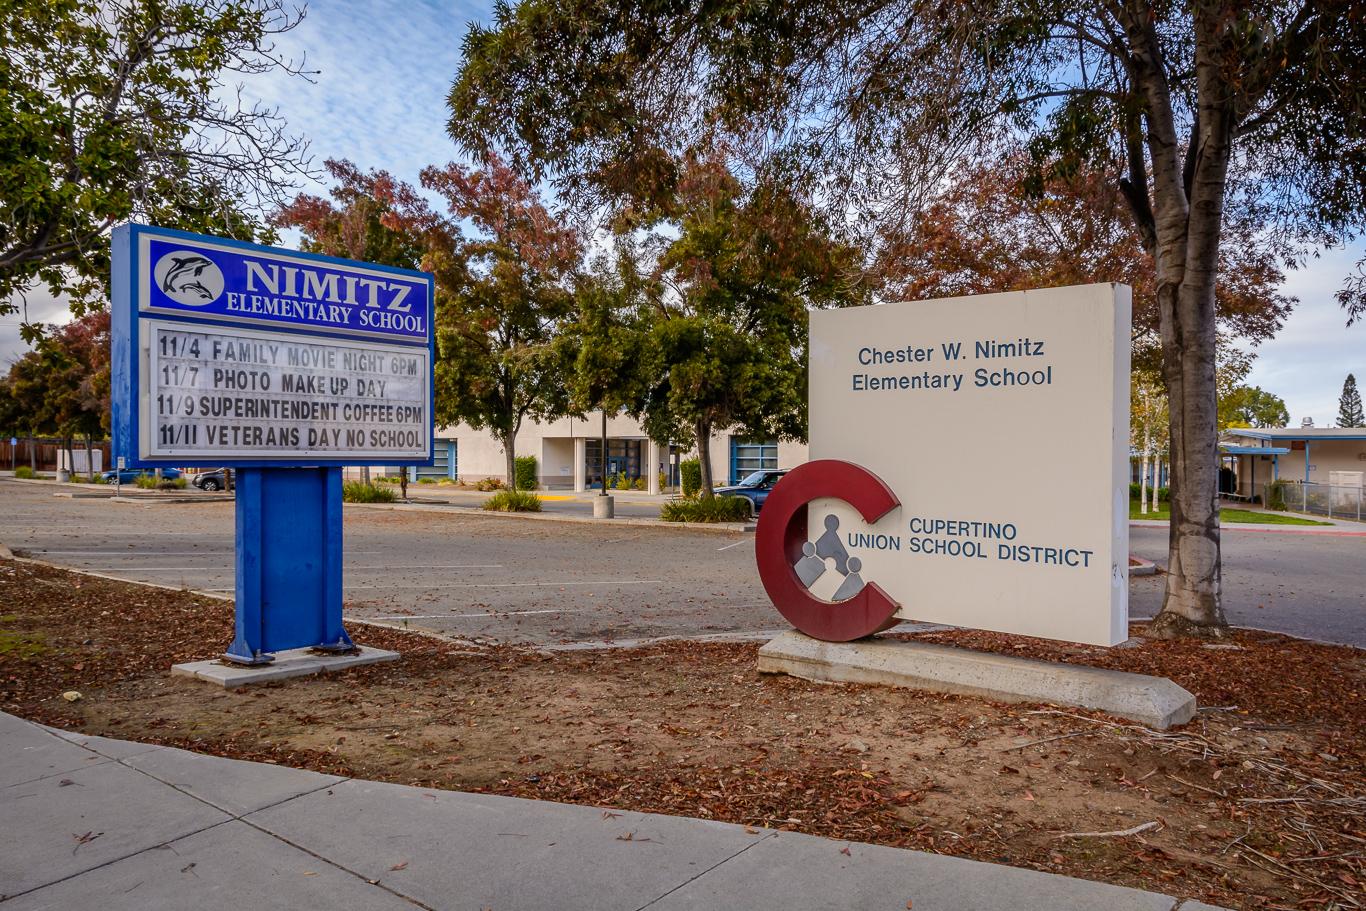 Nimitz Elementary School